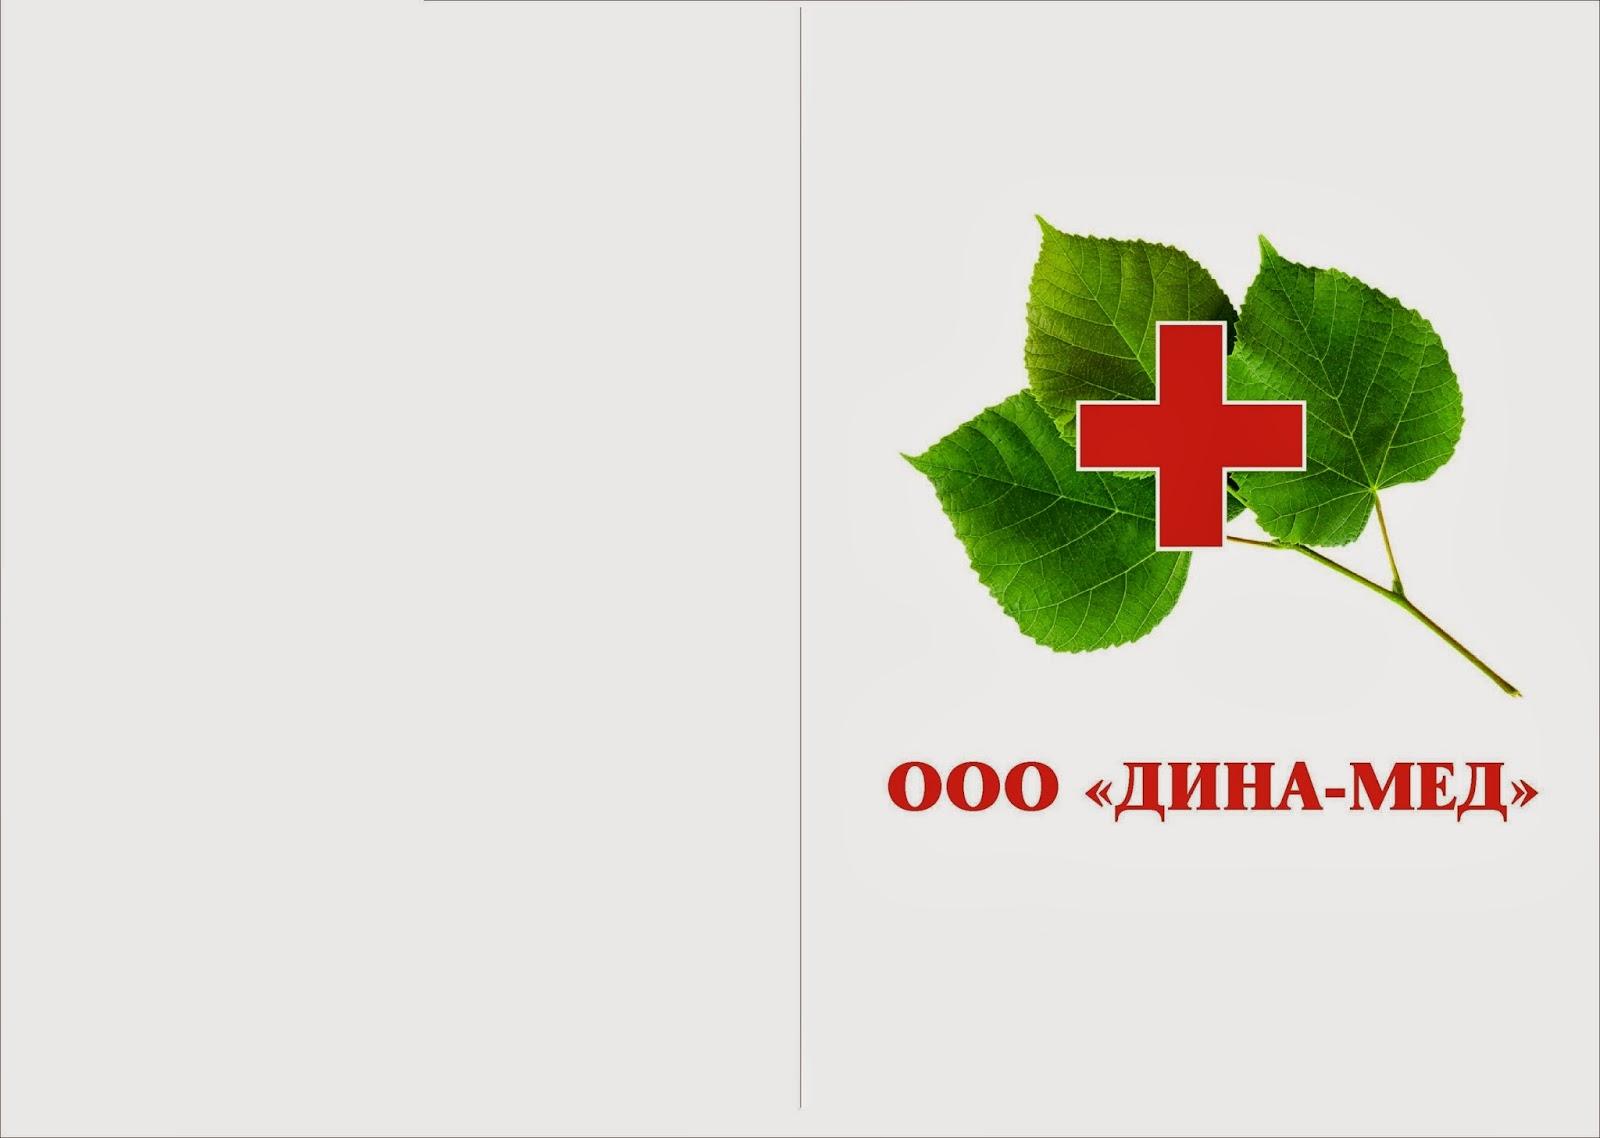 диетолог в чехове